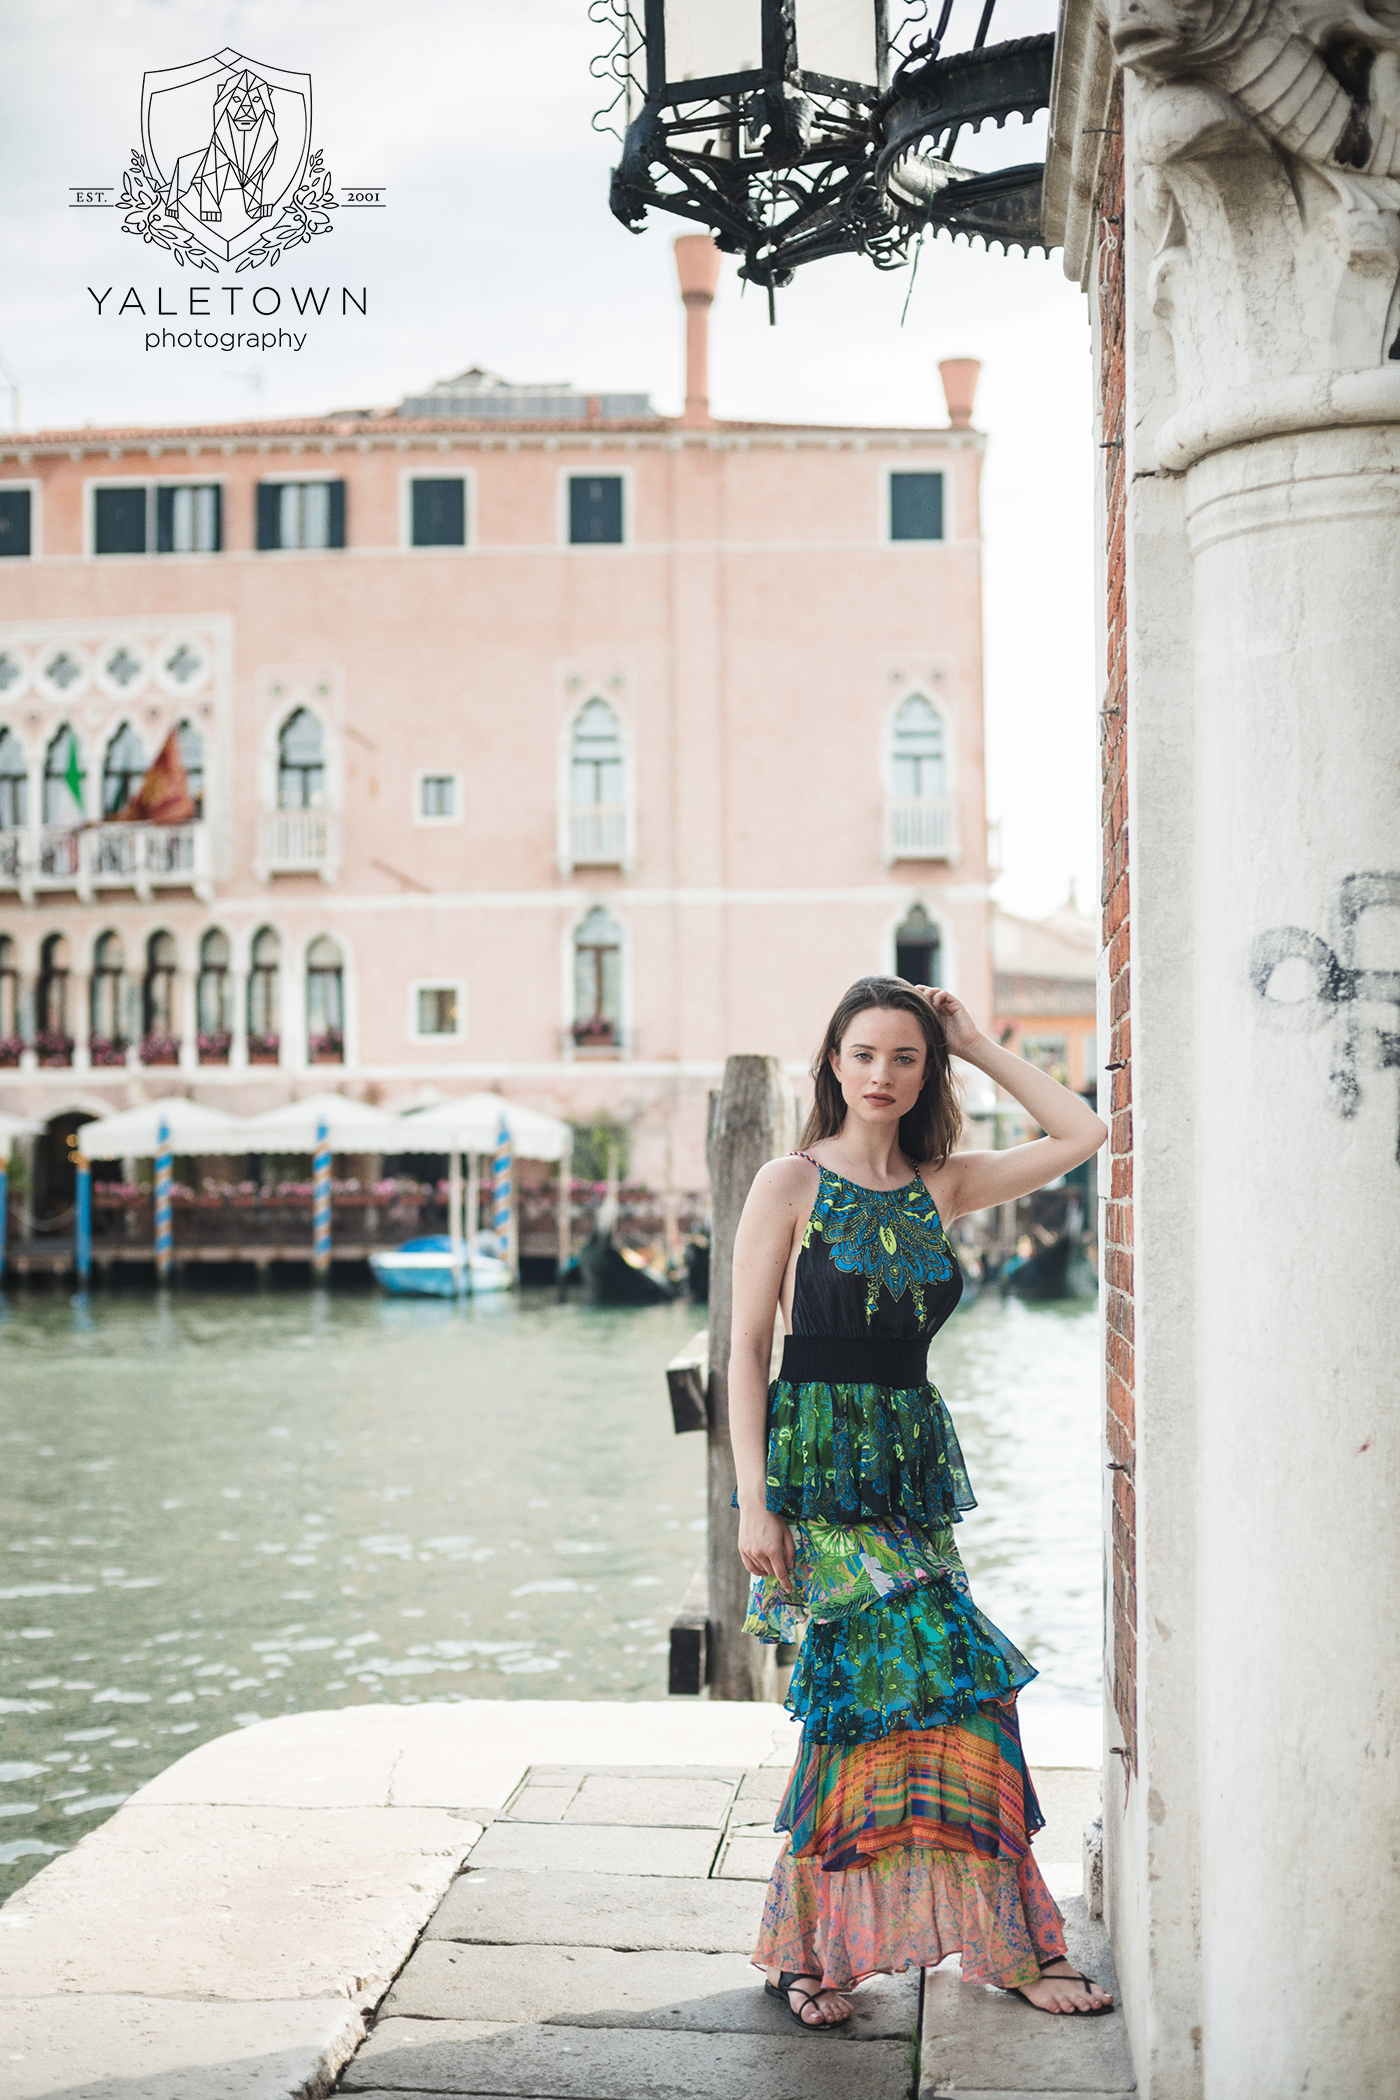 Venice-portrait-session-yaletown-photography-vacation-photographer-photo-019.jpg